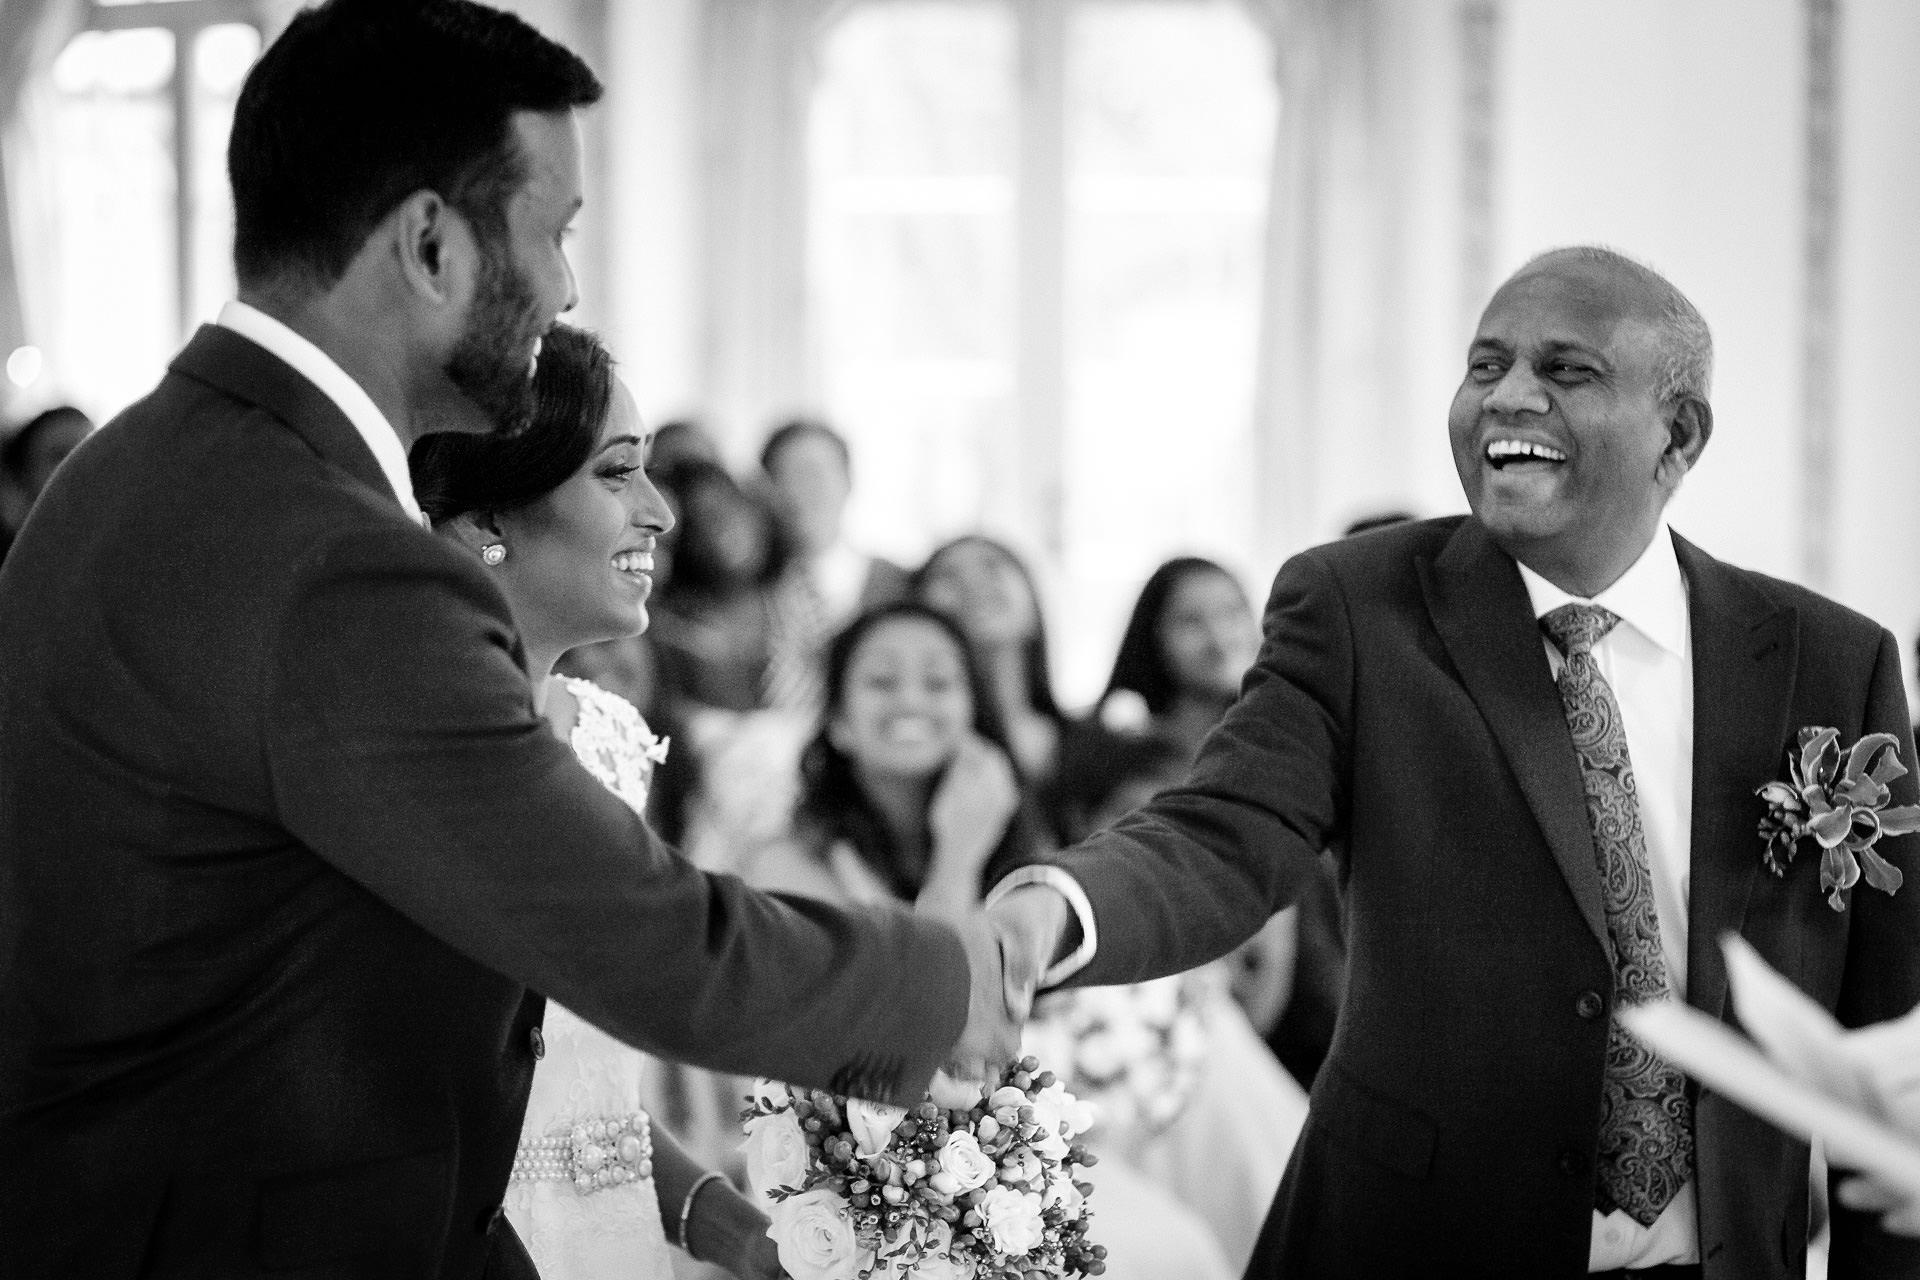 Tamil Wedding Civil Ceremony Groom Shakes Hand Father Of Bride